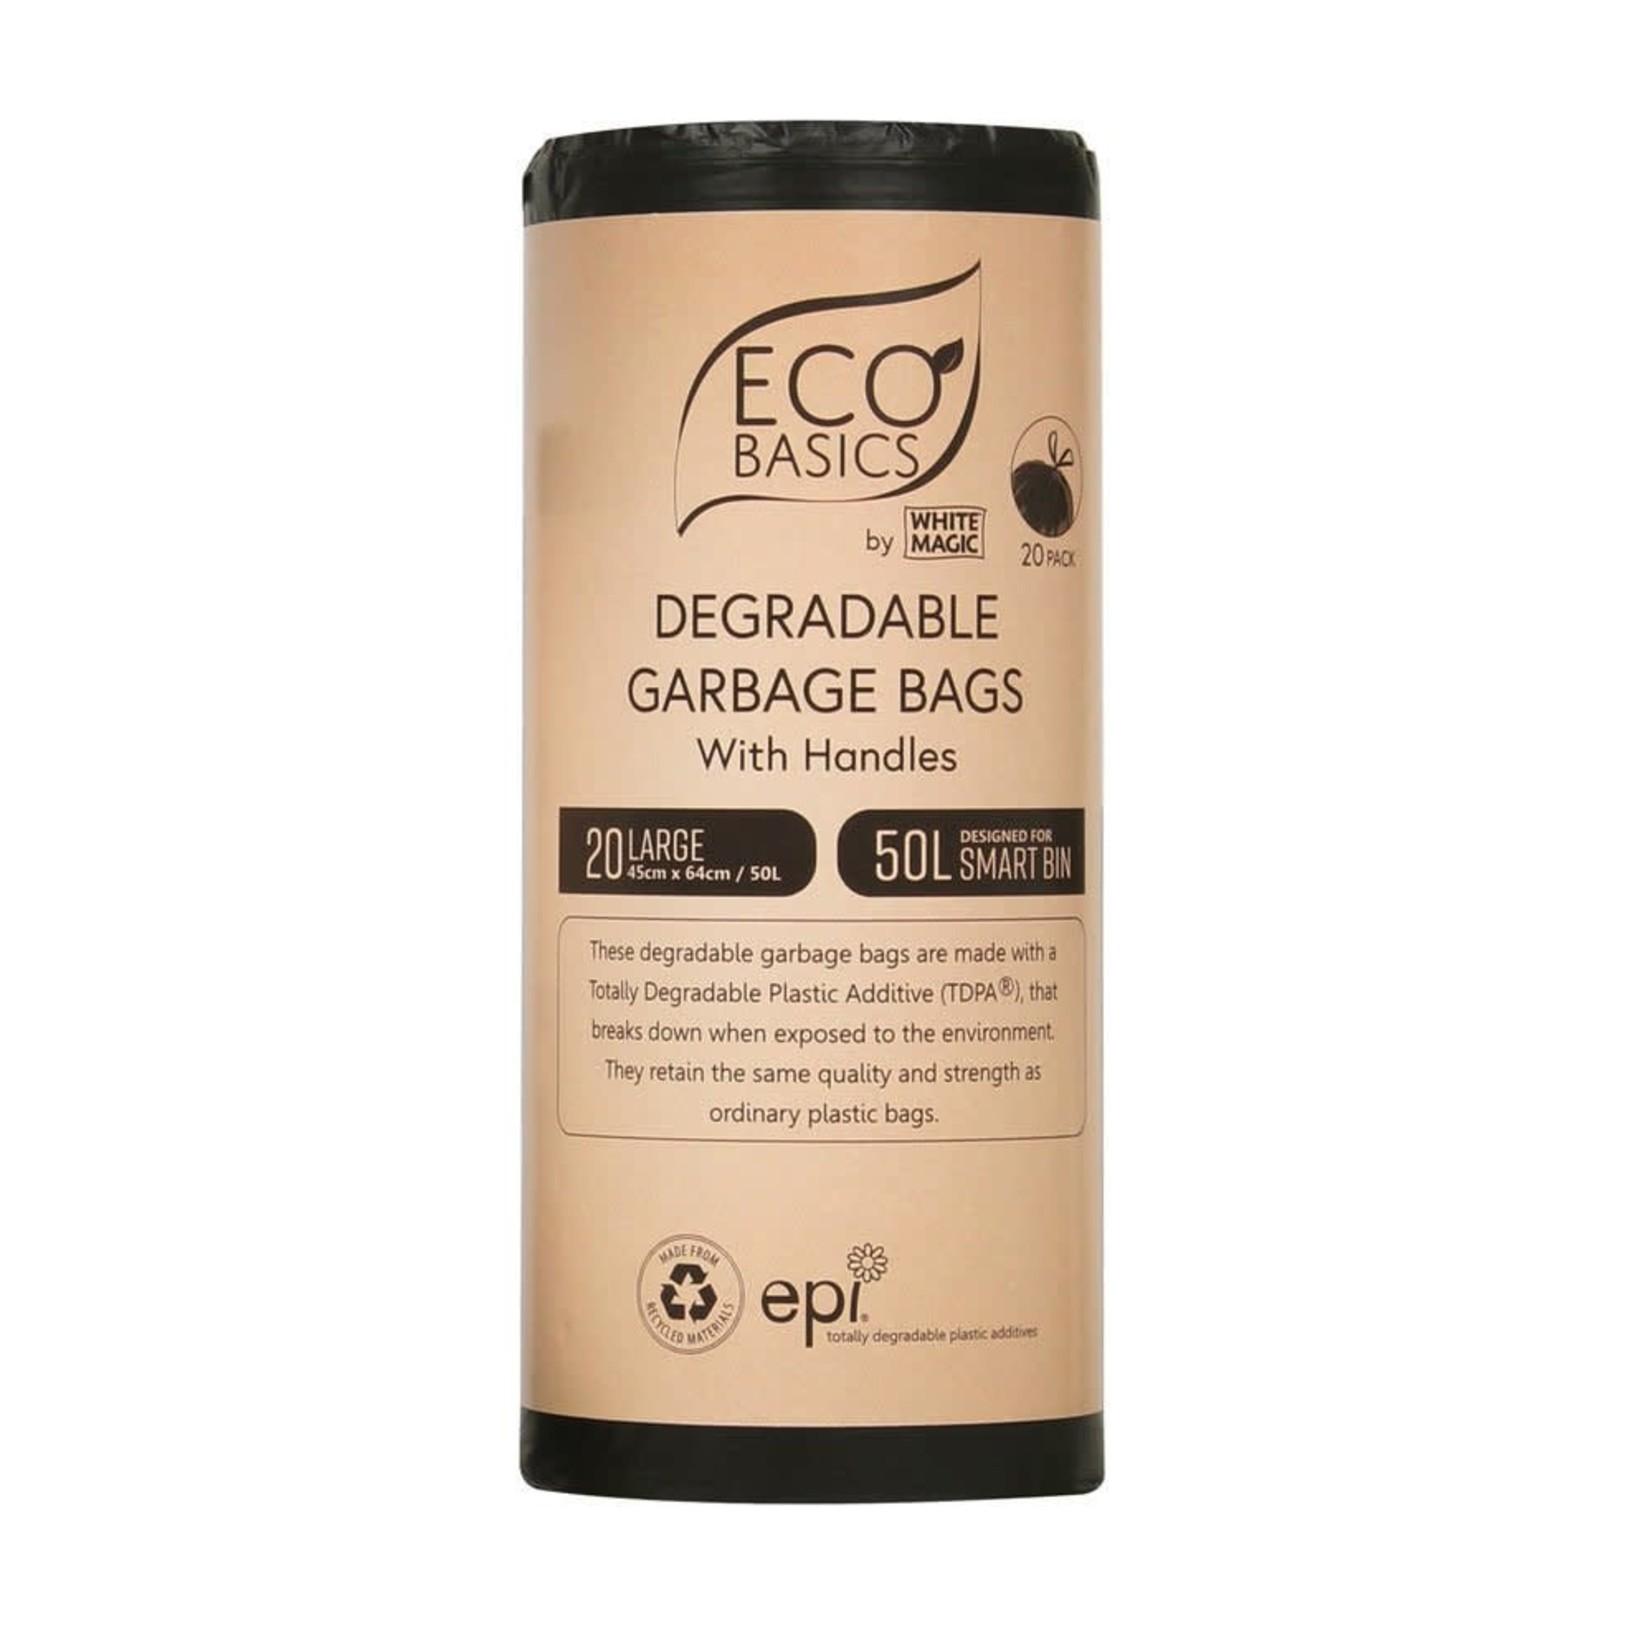 Eco Basics Eco Basics Degradable Garbage Bags